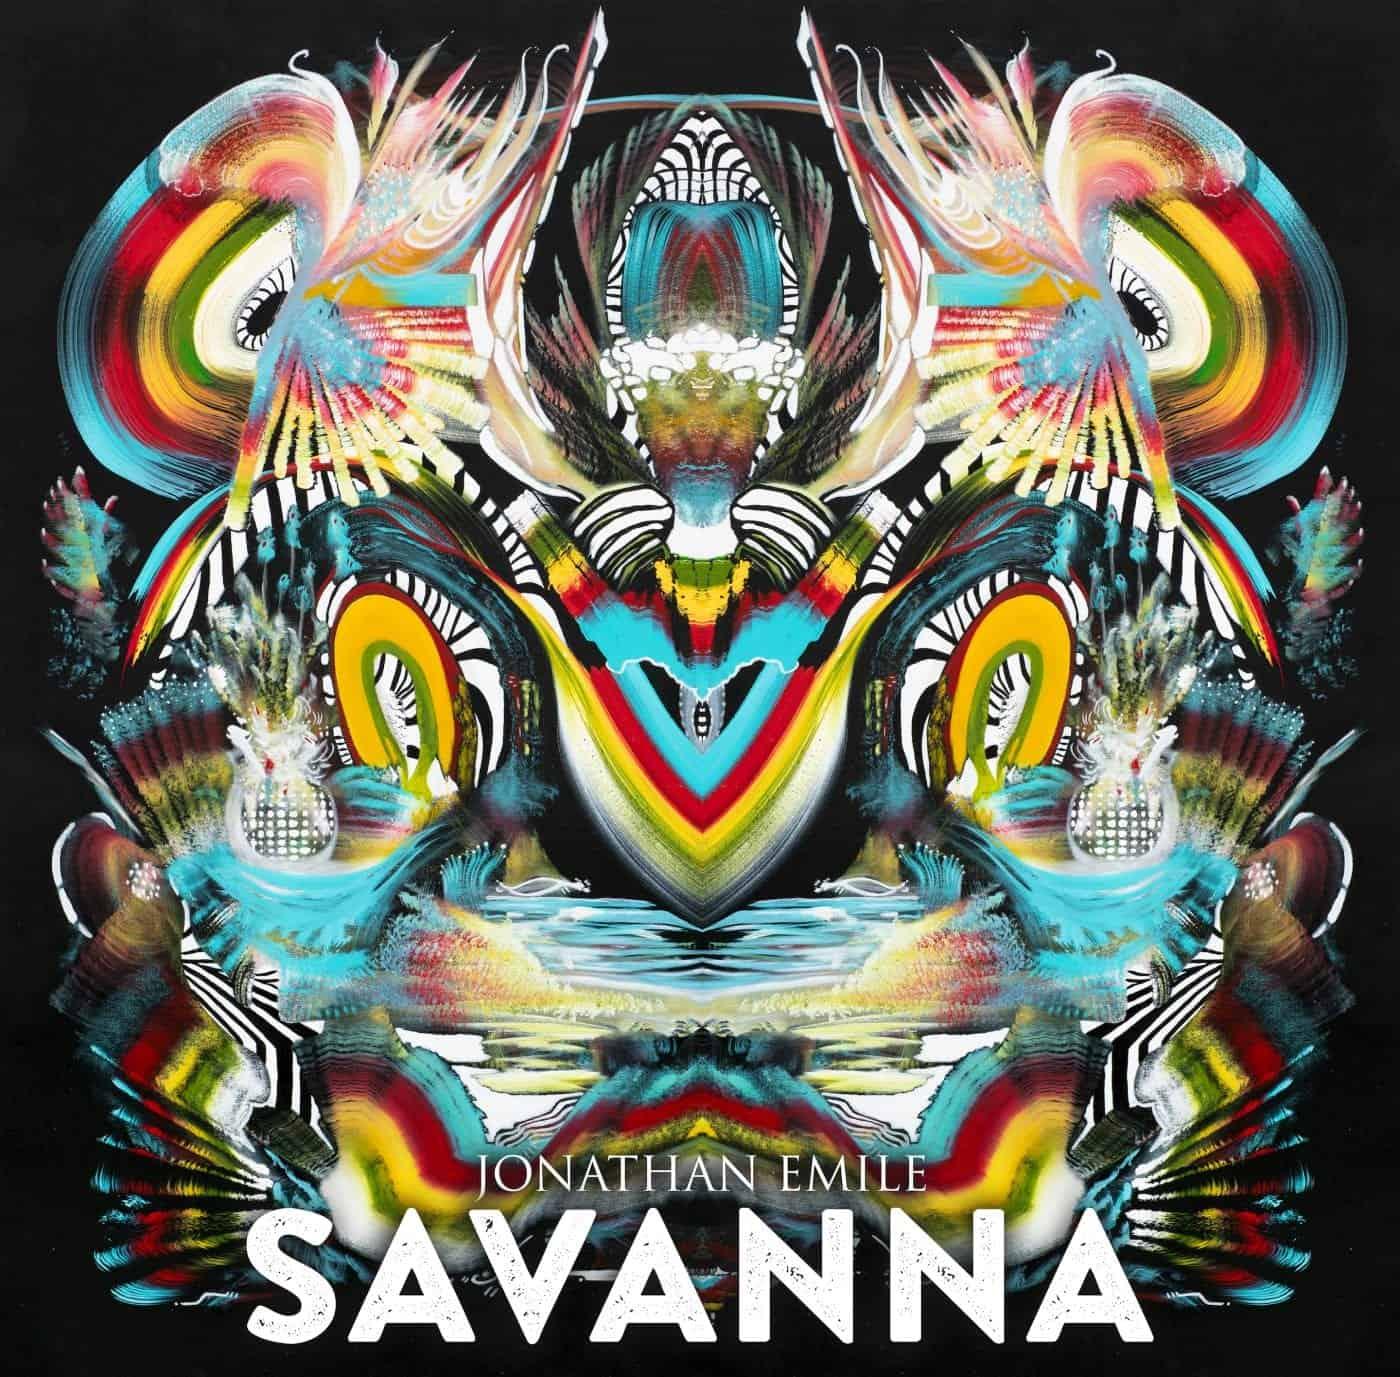 Jonathan Emile - Savanna - Tuff Gong International